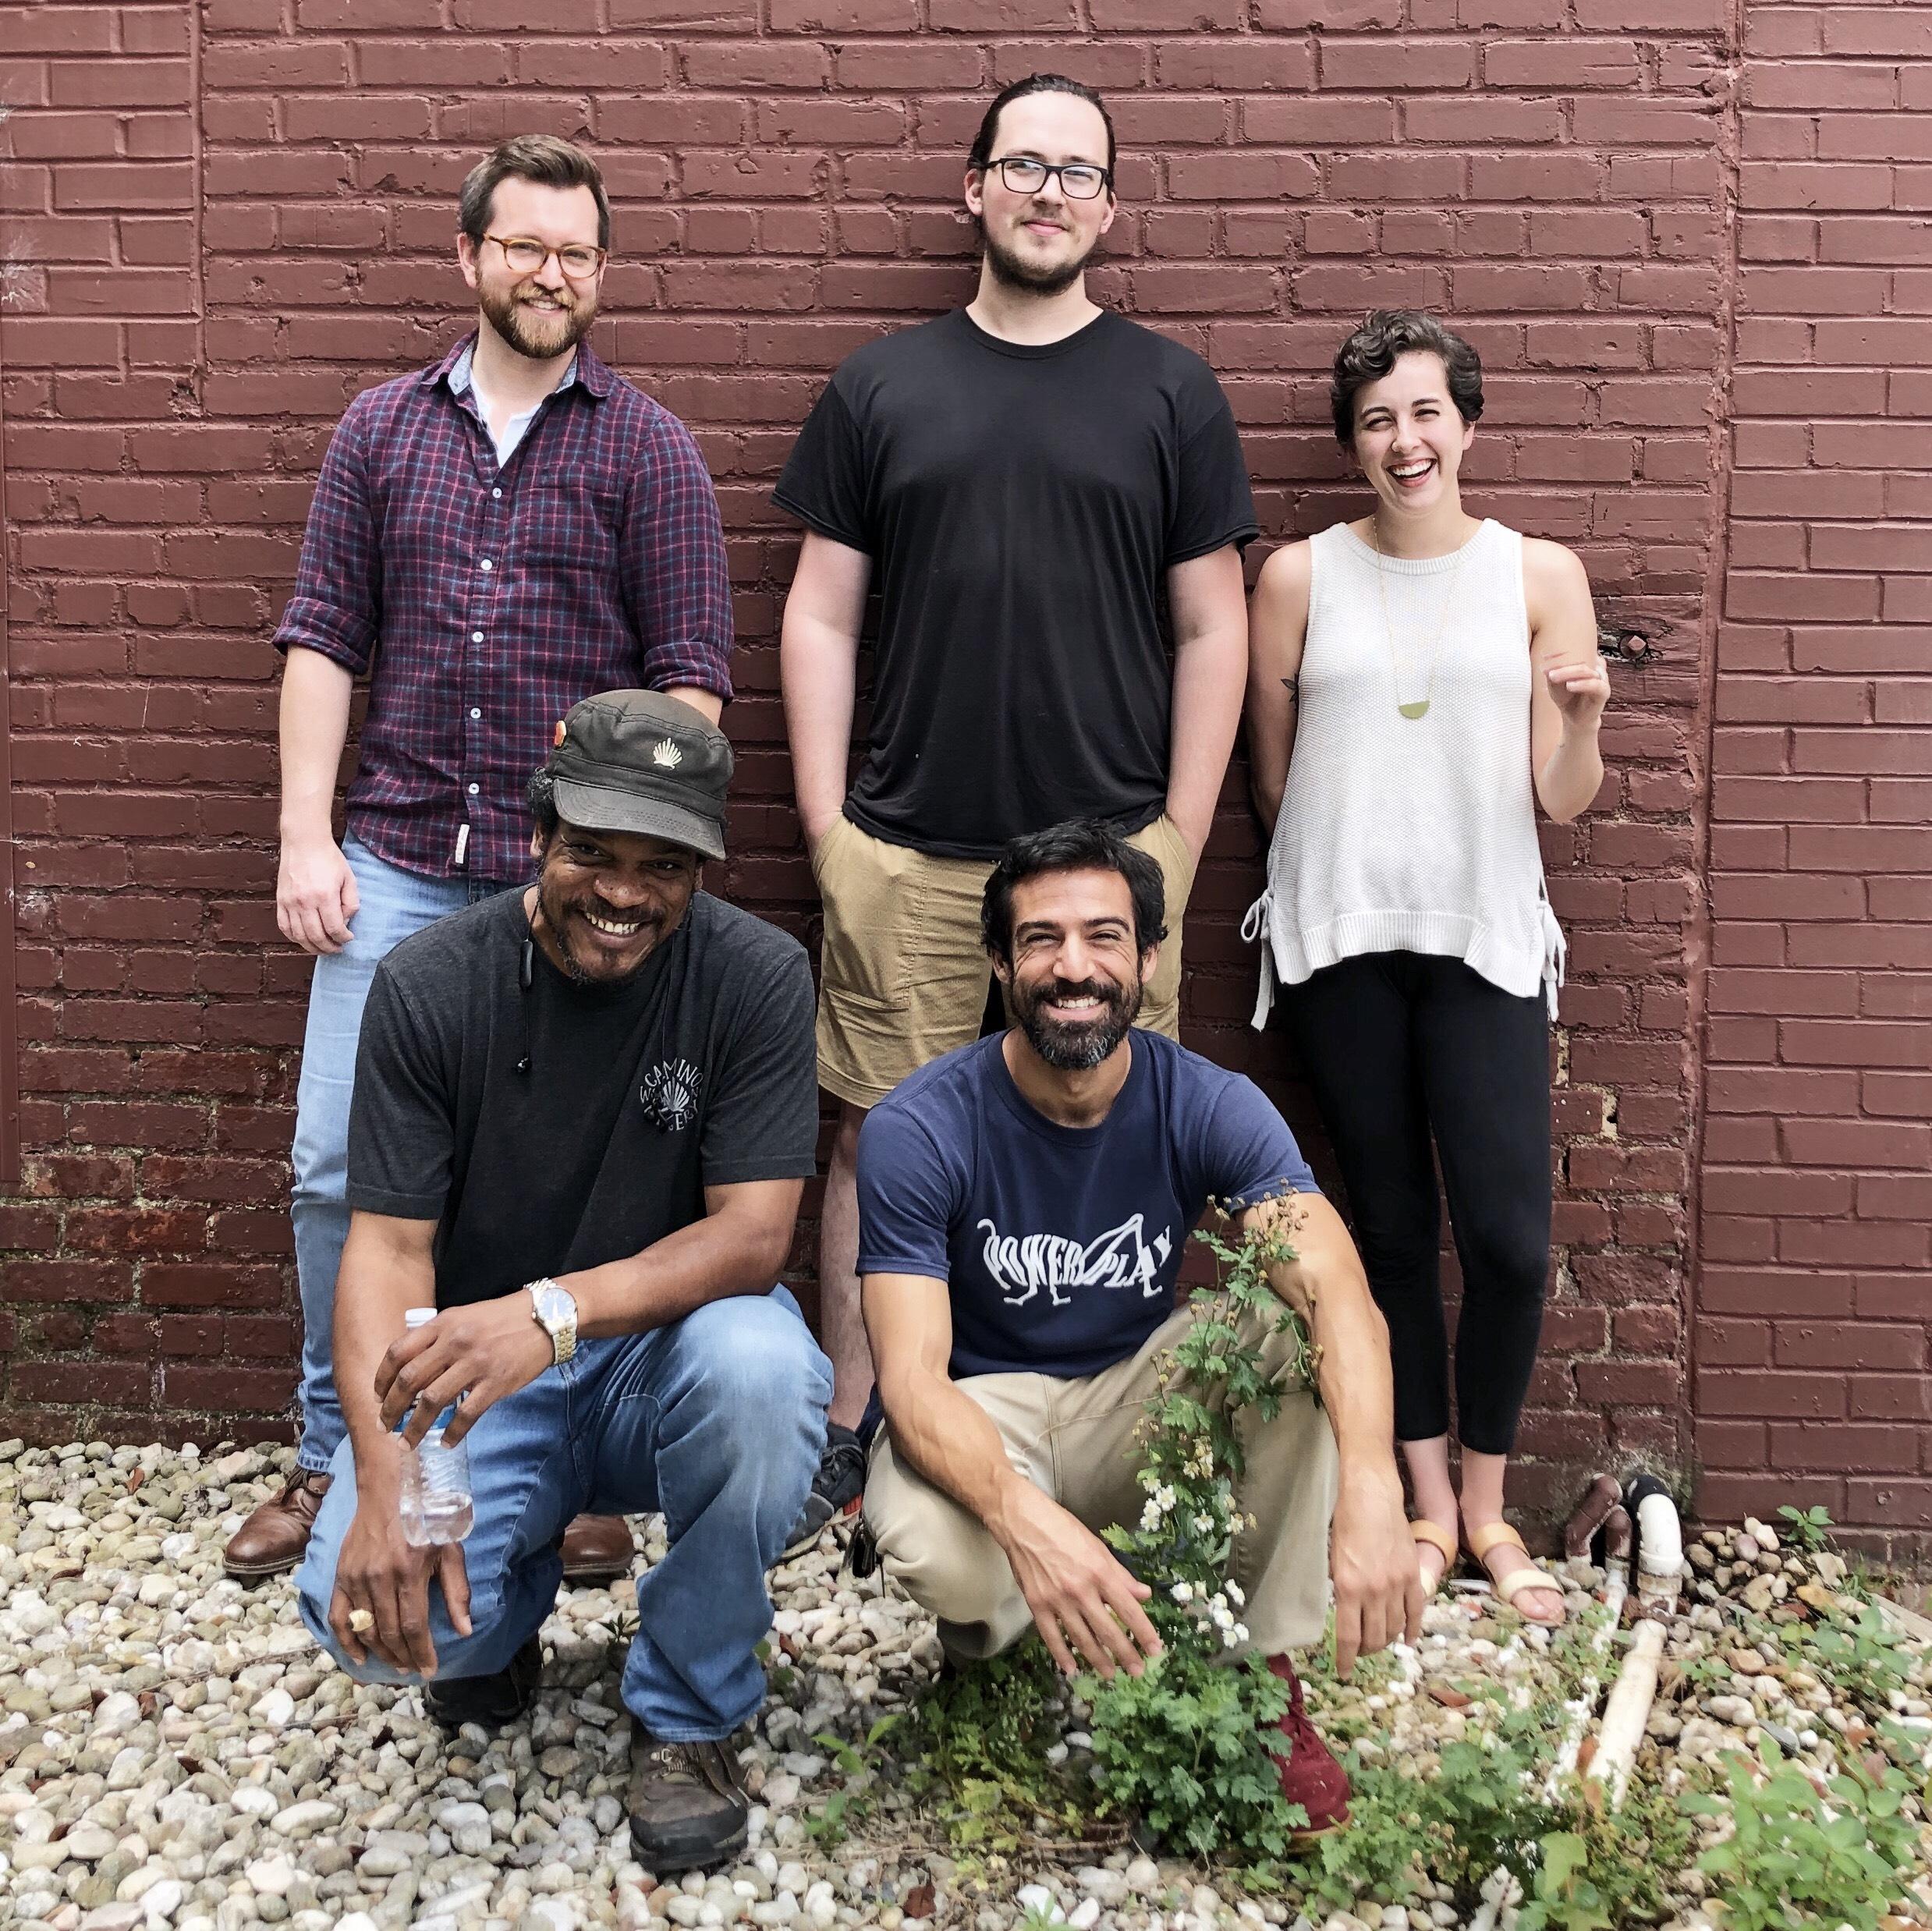 Wholesale team: Nate, patrick, amber, jermaine & quique